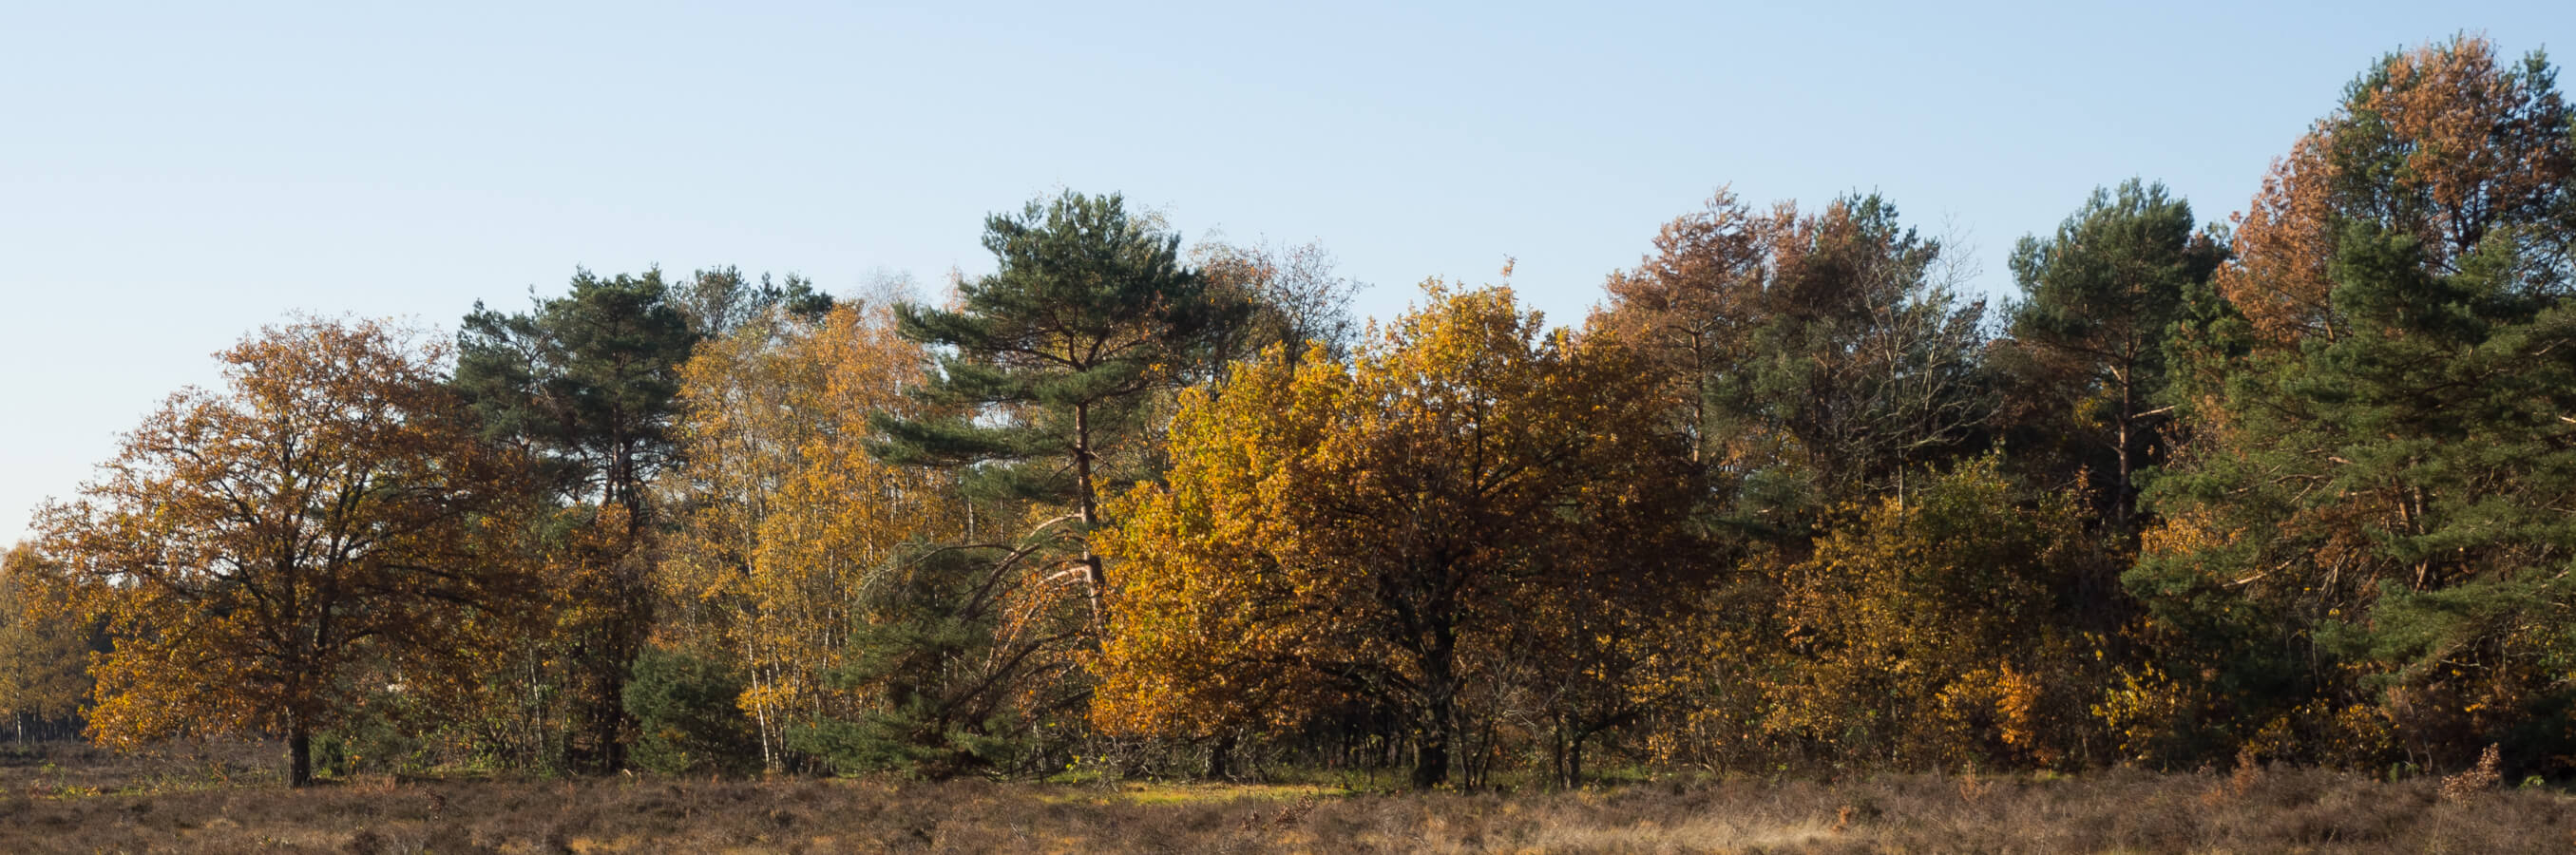 Heide Bussum herfstbomen